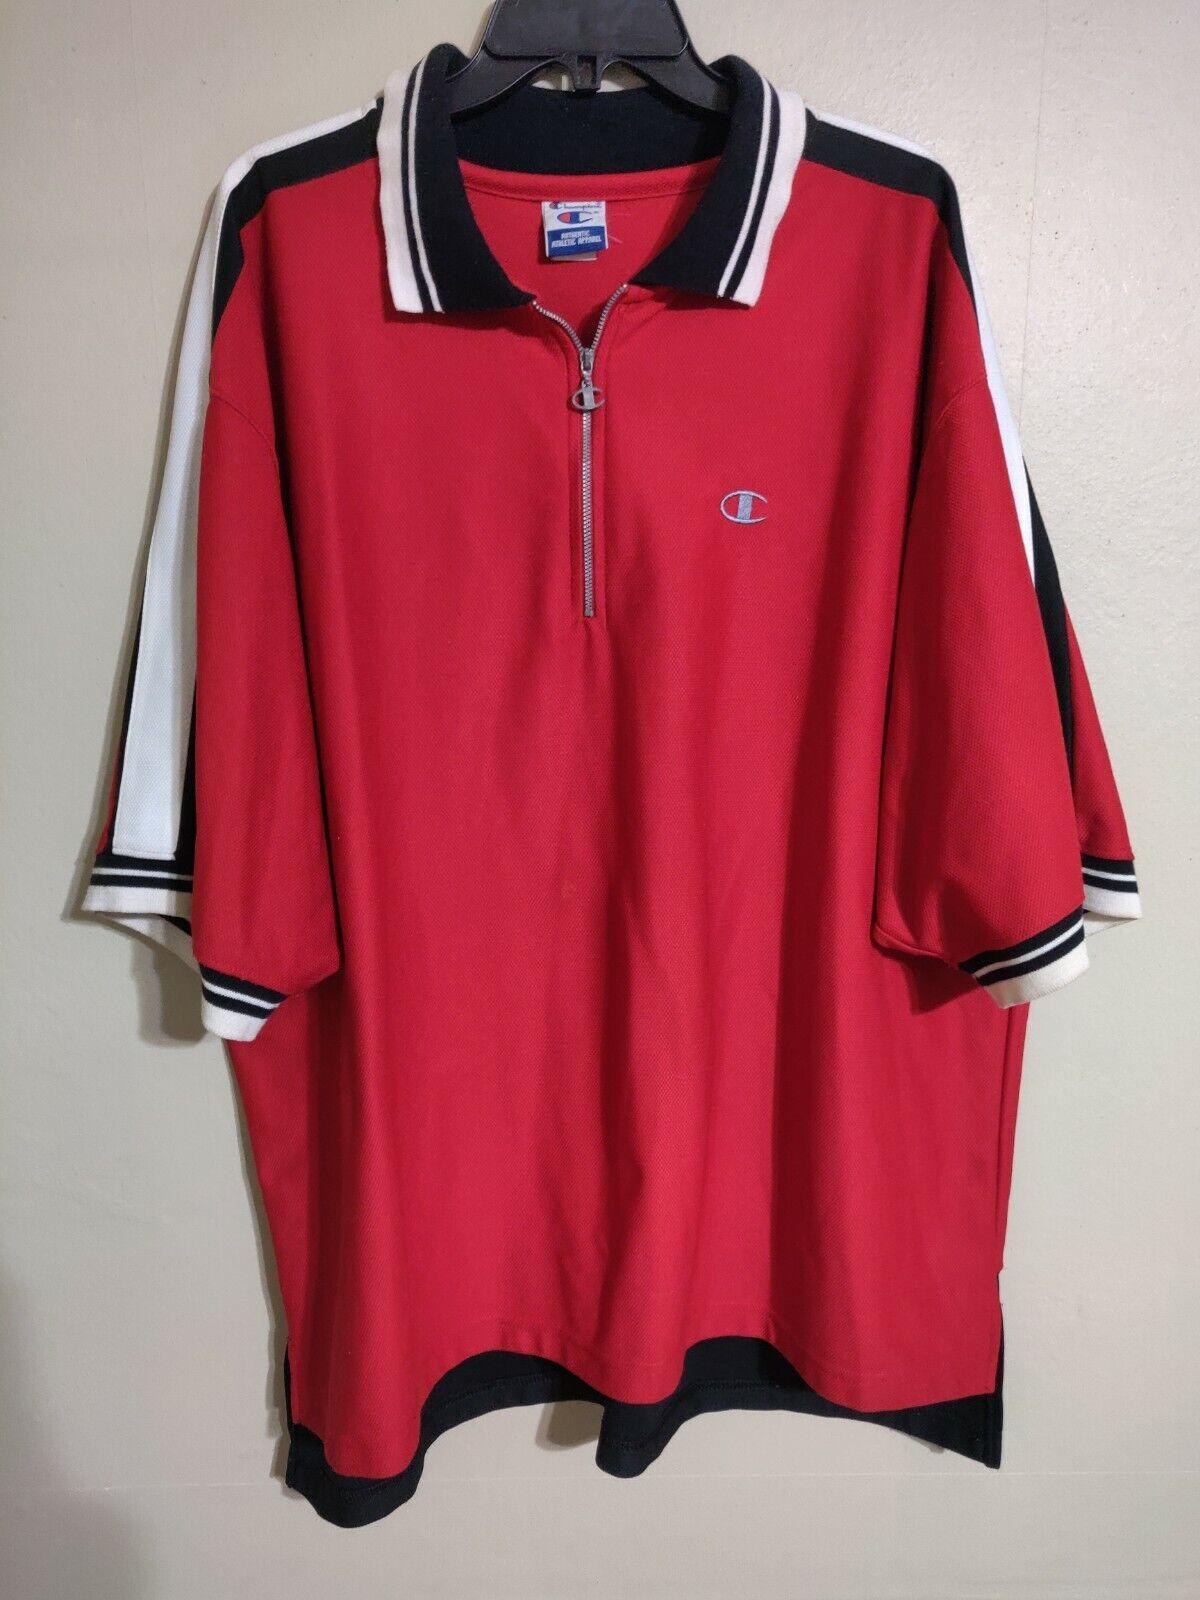 Vintage Champion Made in USA 1 4 Zip Basketball Shooting Warm Up Shirt Men's 2XL